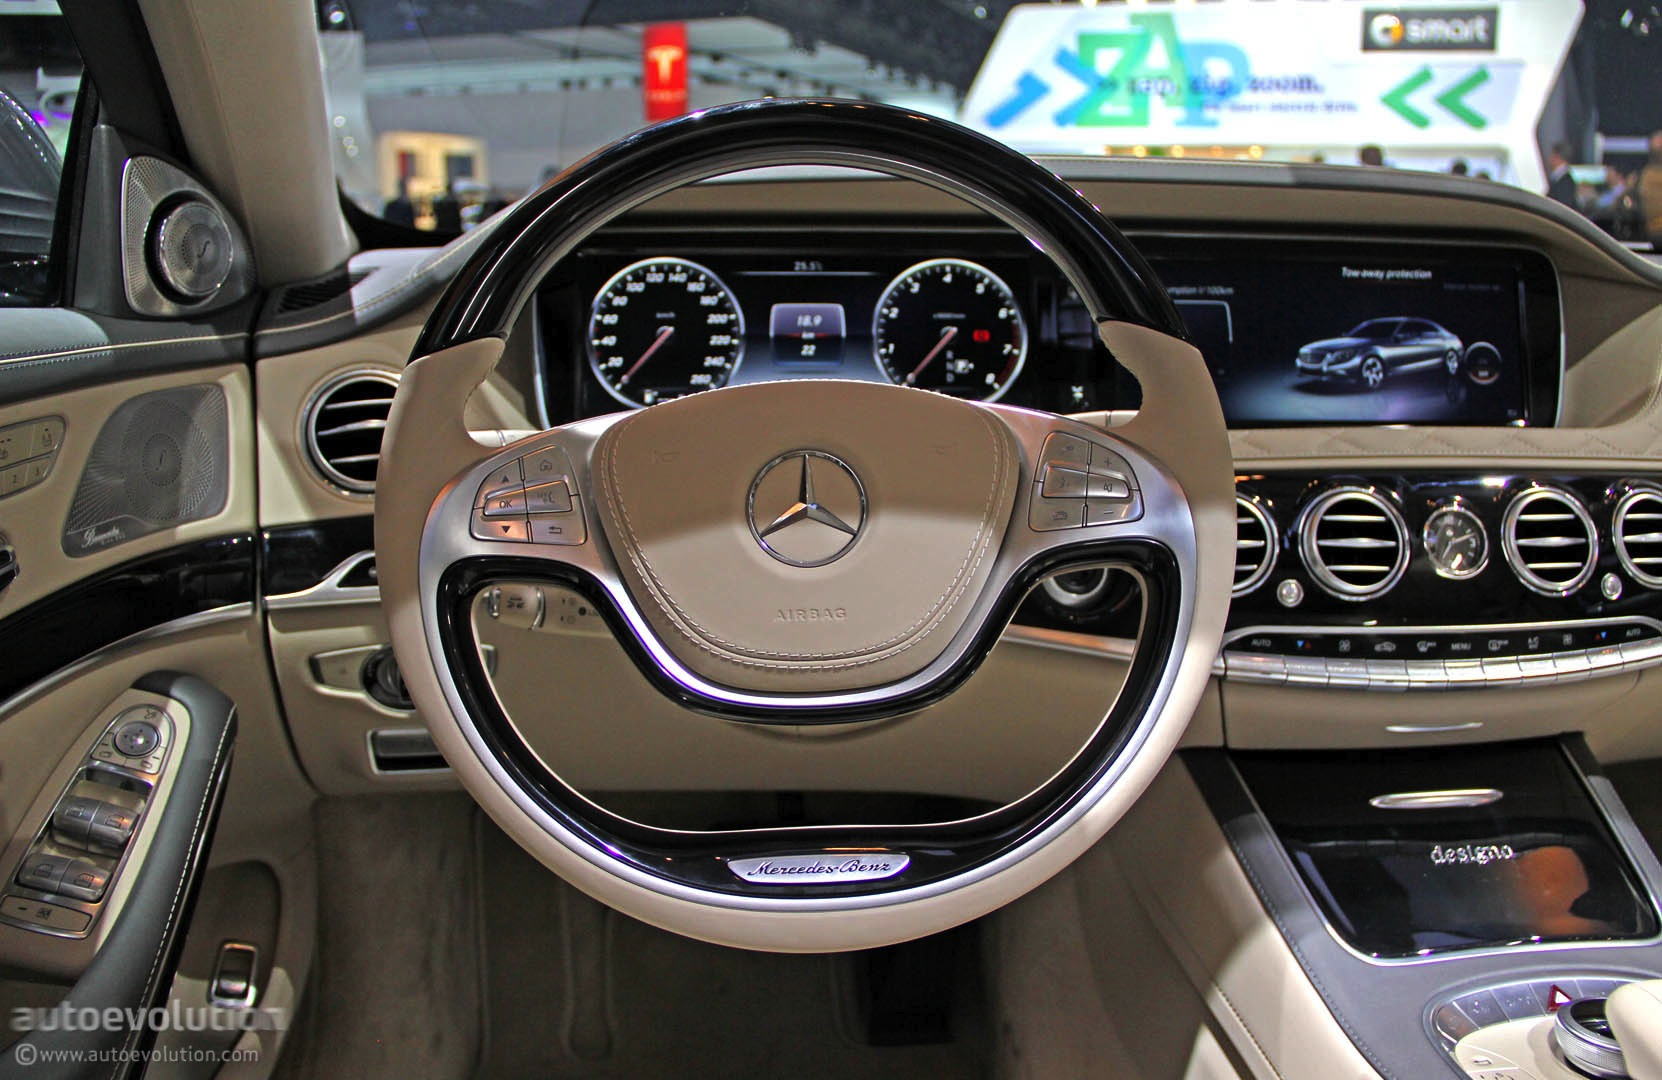 Engine Live 3d Wallpaper 2014 Mercedes S600 Amg Www Pixshark Com Images